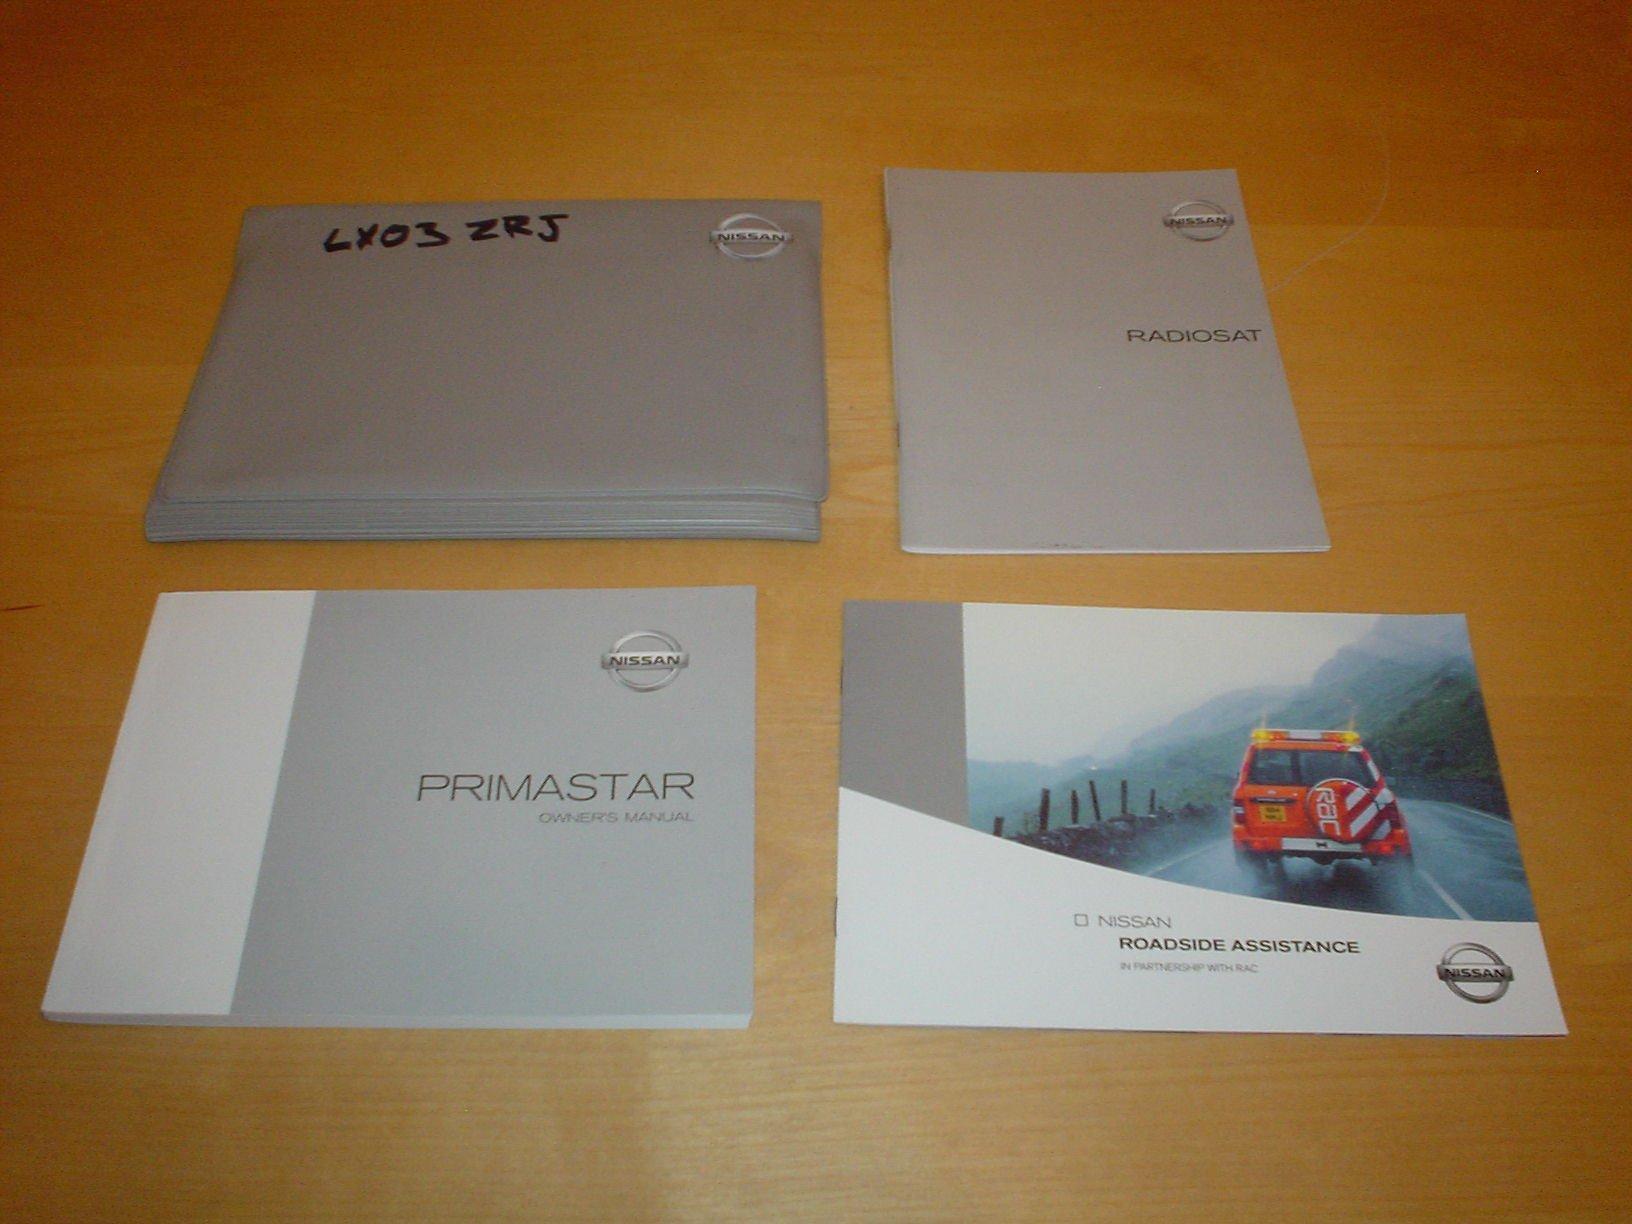 NISSAN PRIMASTAR OWNERS MANUAL HANDBOOK PRIMA STAR VAN COMBI MINIBUS - 2.0  Litre PETROL ENGINE 1.9 dCi DIESEL - OWNER'S HAND BOOK MANUAL:  Amazon.co.uk: ...